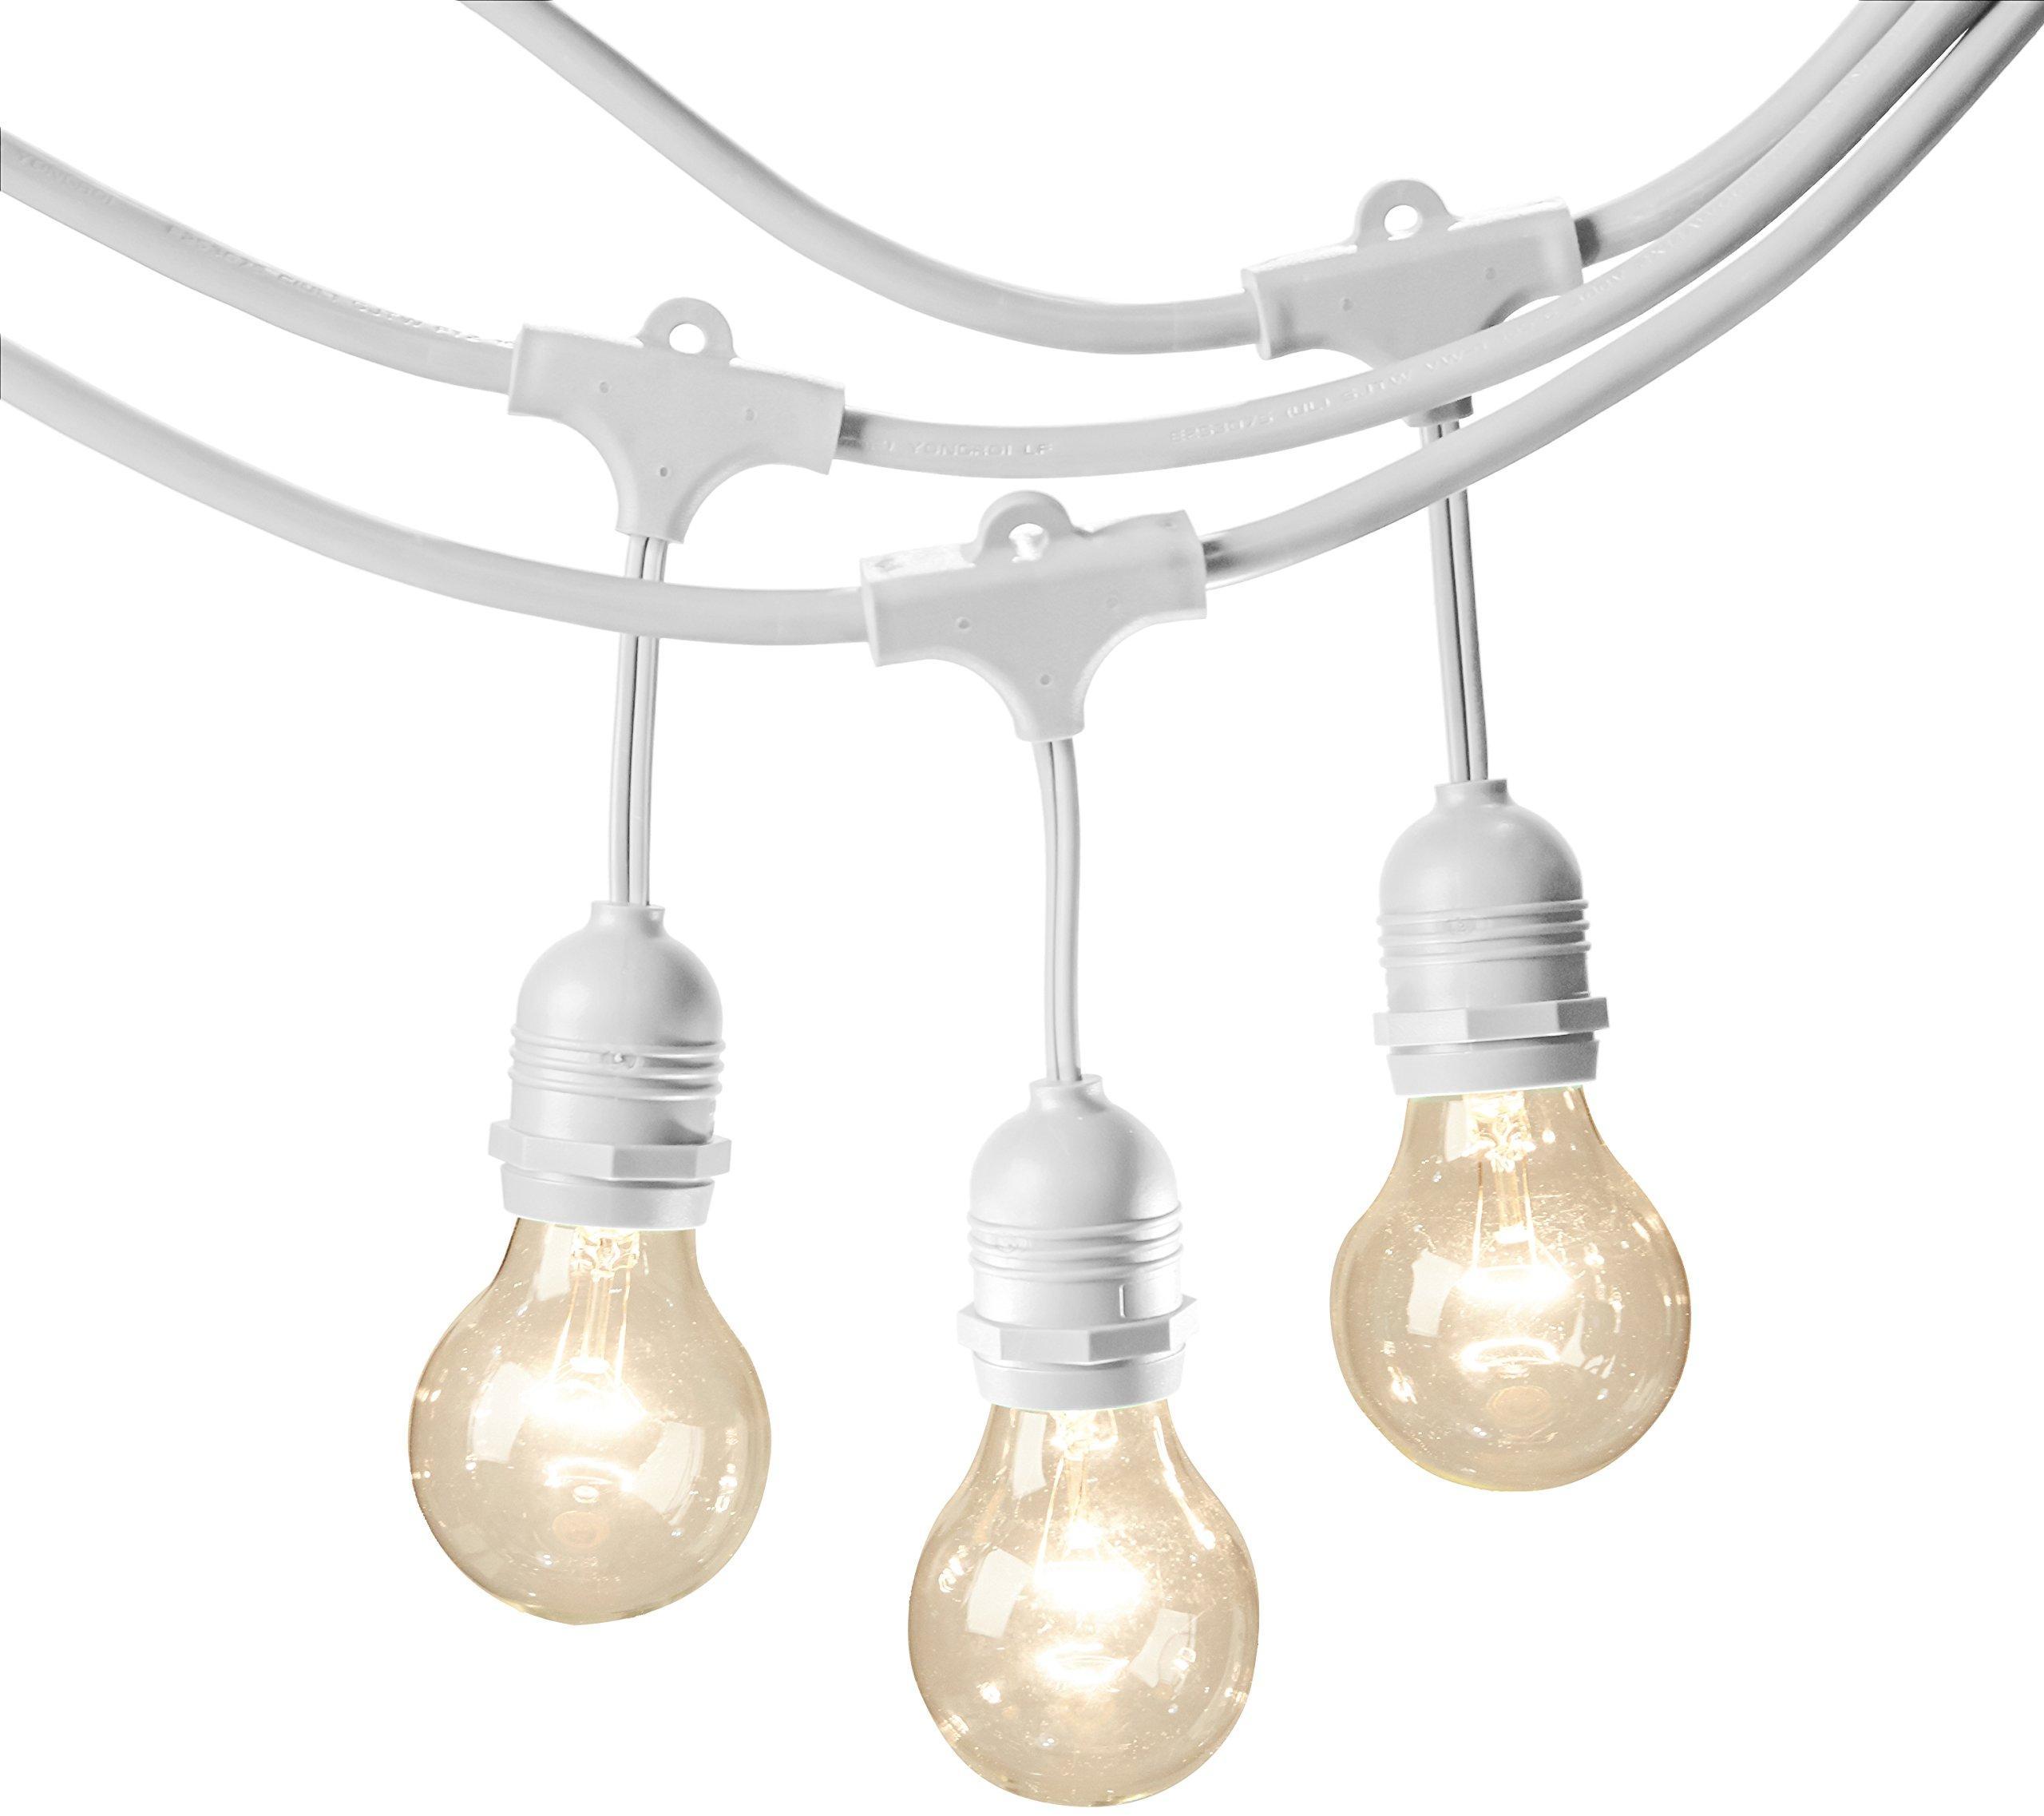 amazonbasics weatherproof outdoor patio string lights g60 bulb white 48 foot. Black Bedroom Furniture Sets. Home Design Ideas